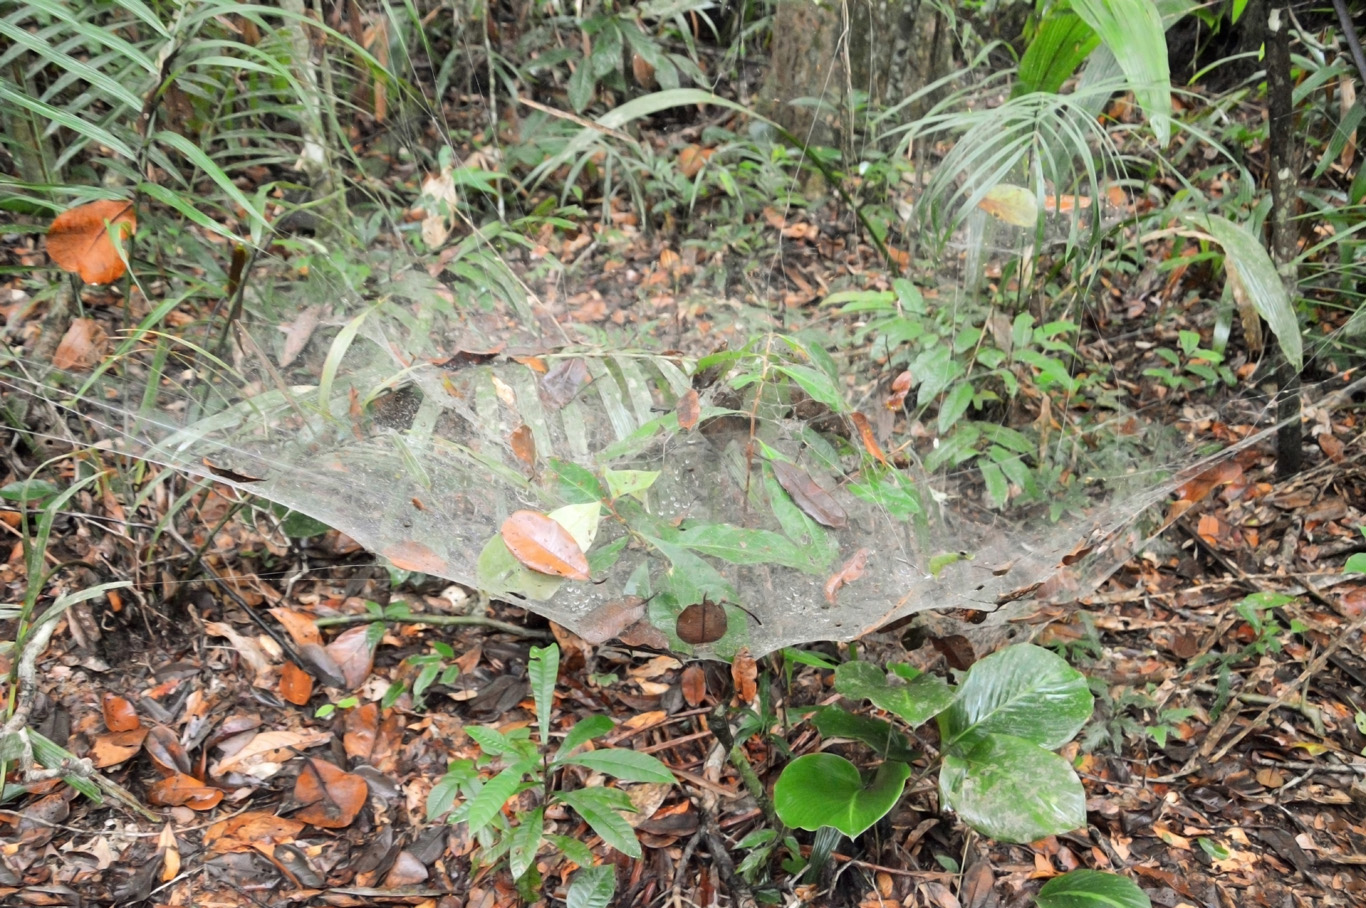 Gargantuan spider web - it would easily fit a man